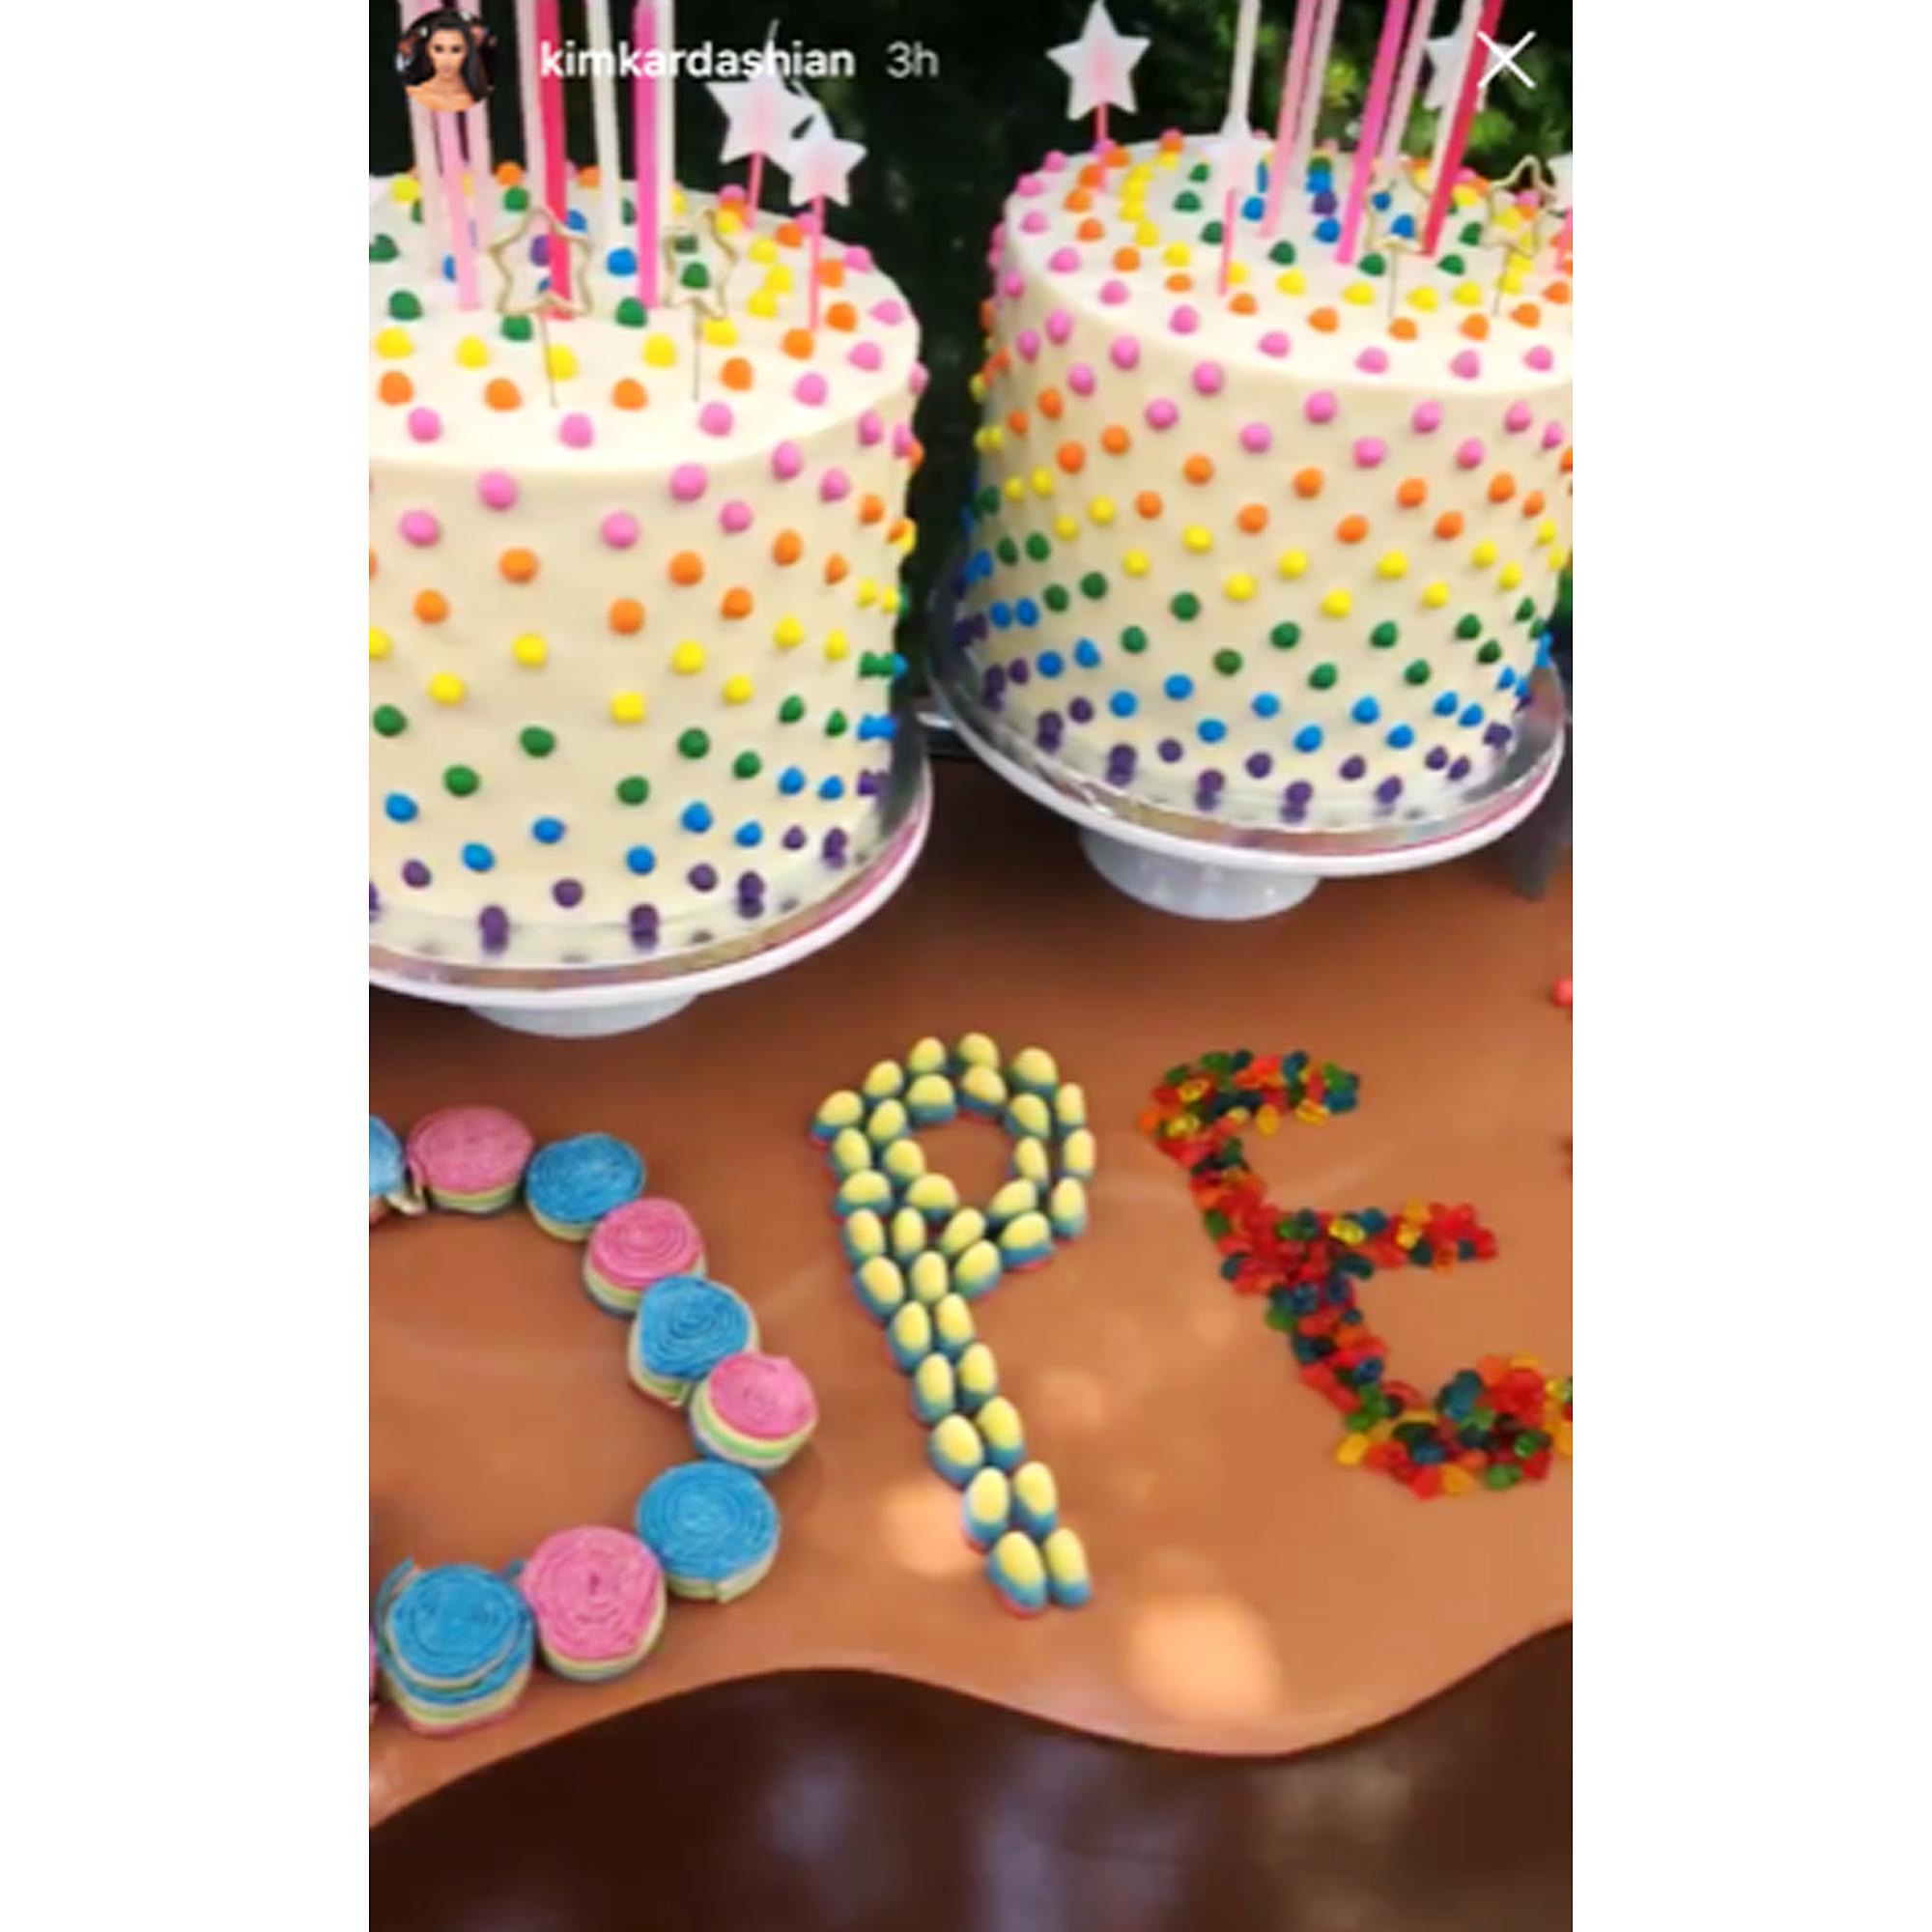 Surprising See The Kardashian Familys Best Cakes Photos Personalised Birthday Cards Sponlily Jamesorg